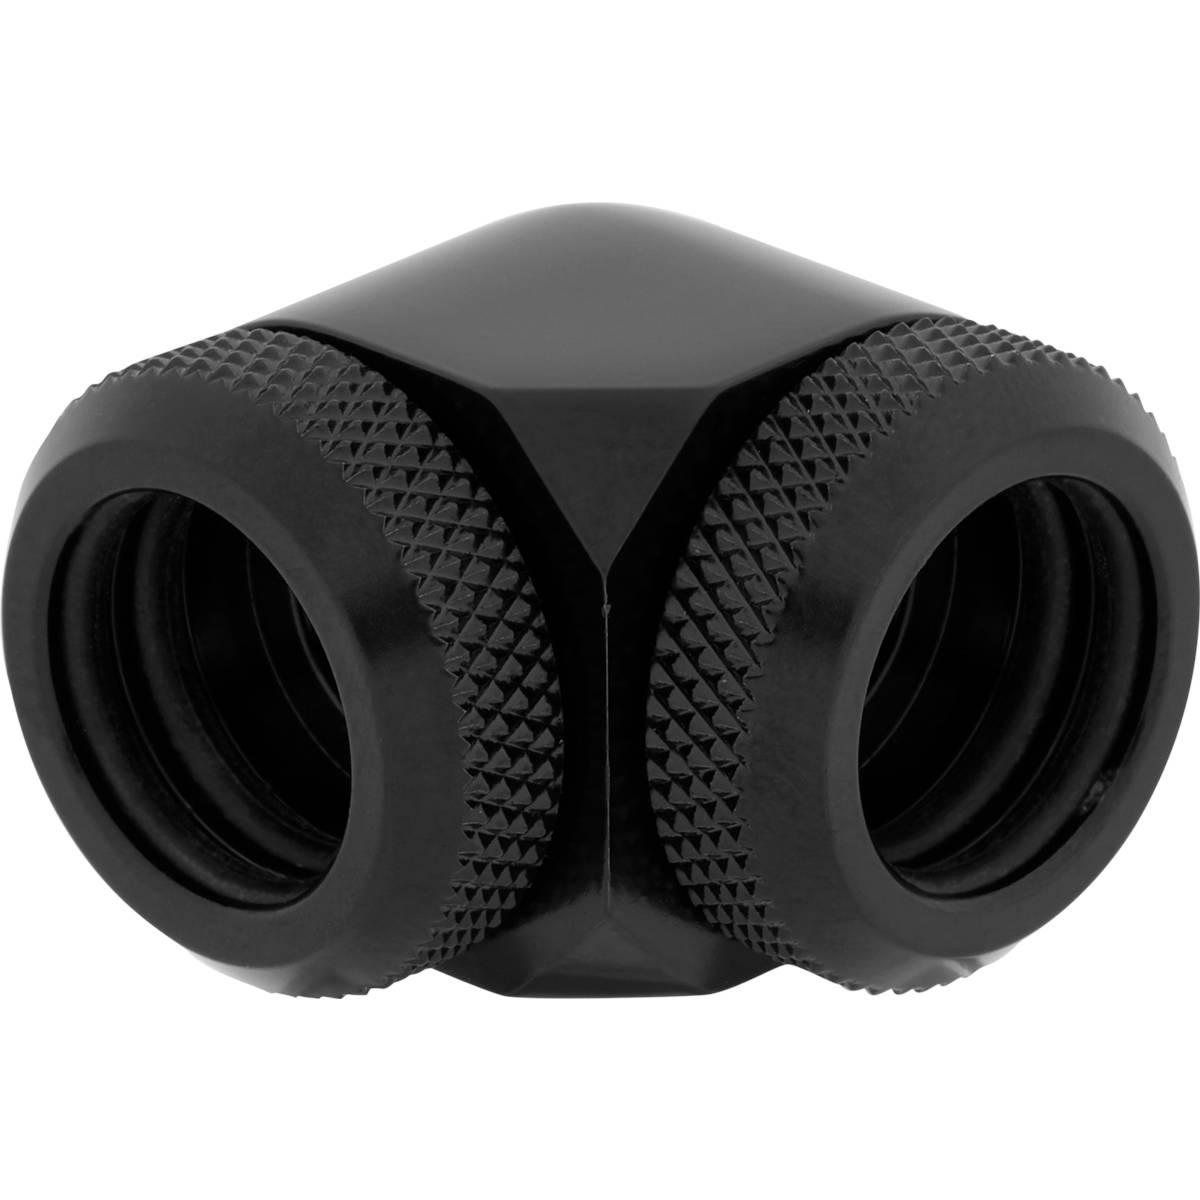 CORSAIR Hydro X Series XF Hardline 90° 14mm OD Fitting Twin Pack - Black